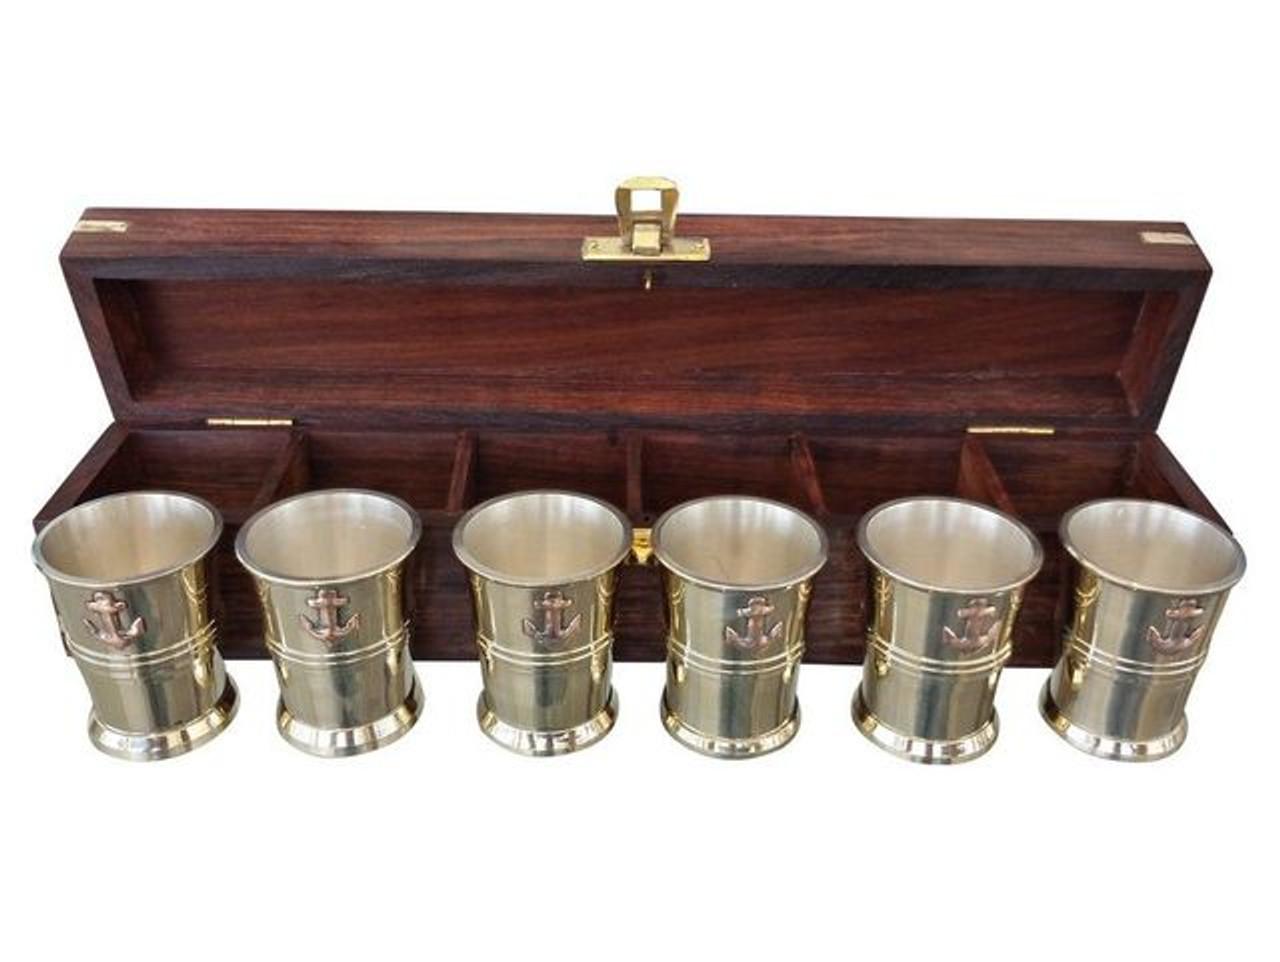 Anchor Shot Glasses Brass Set of 6 Rosewood Case